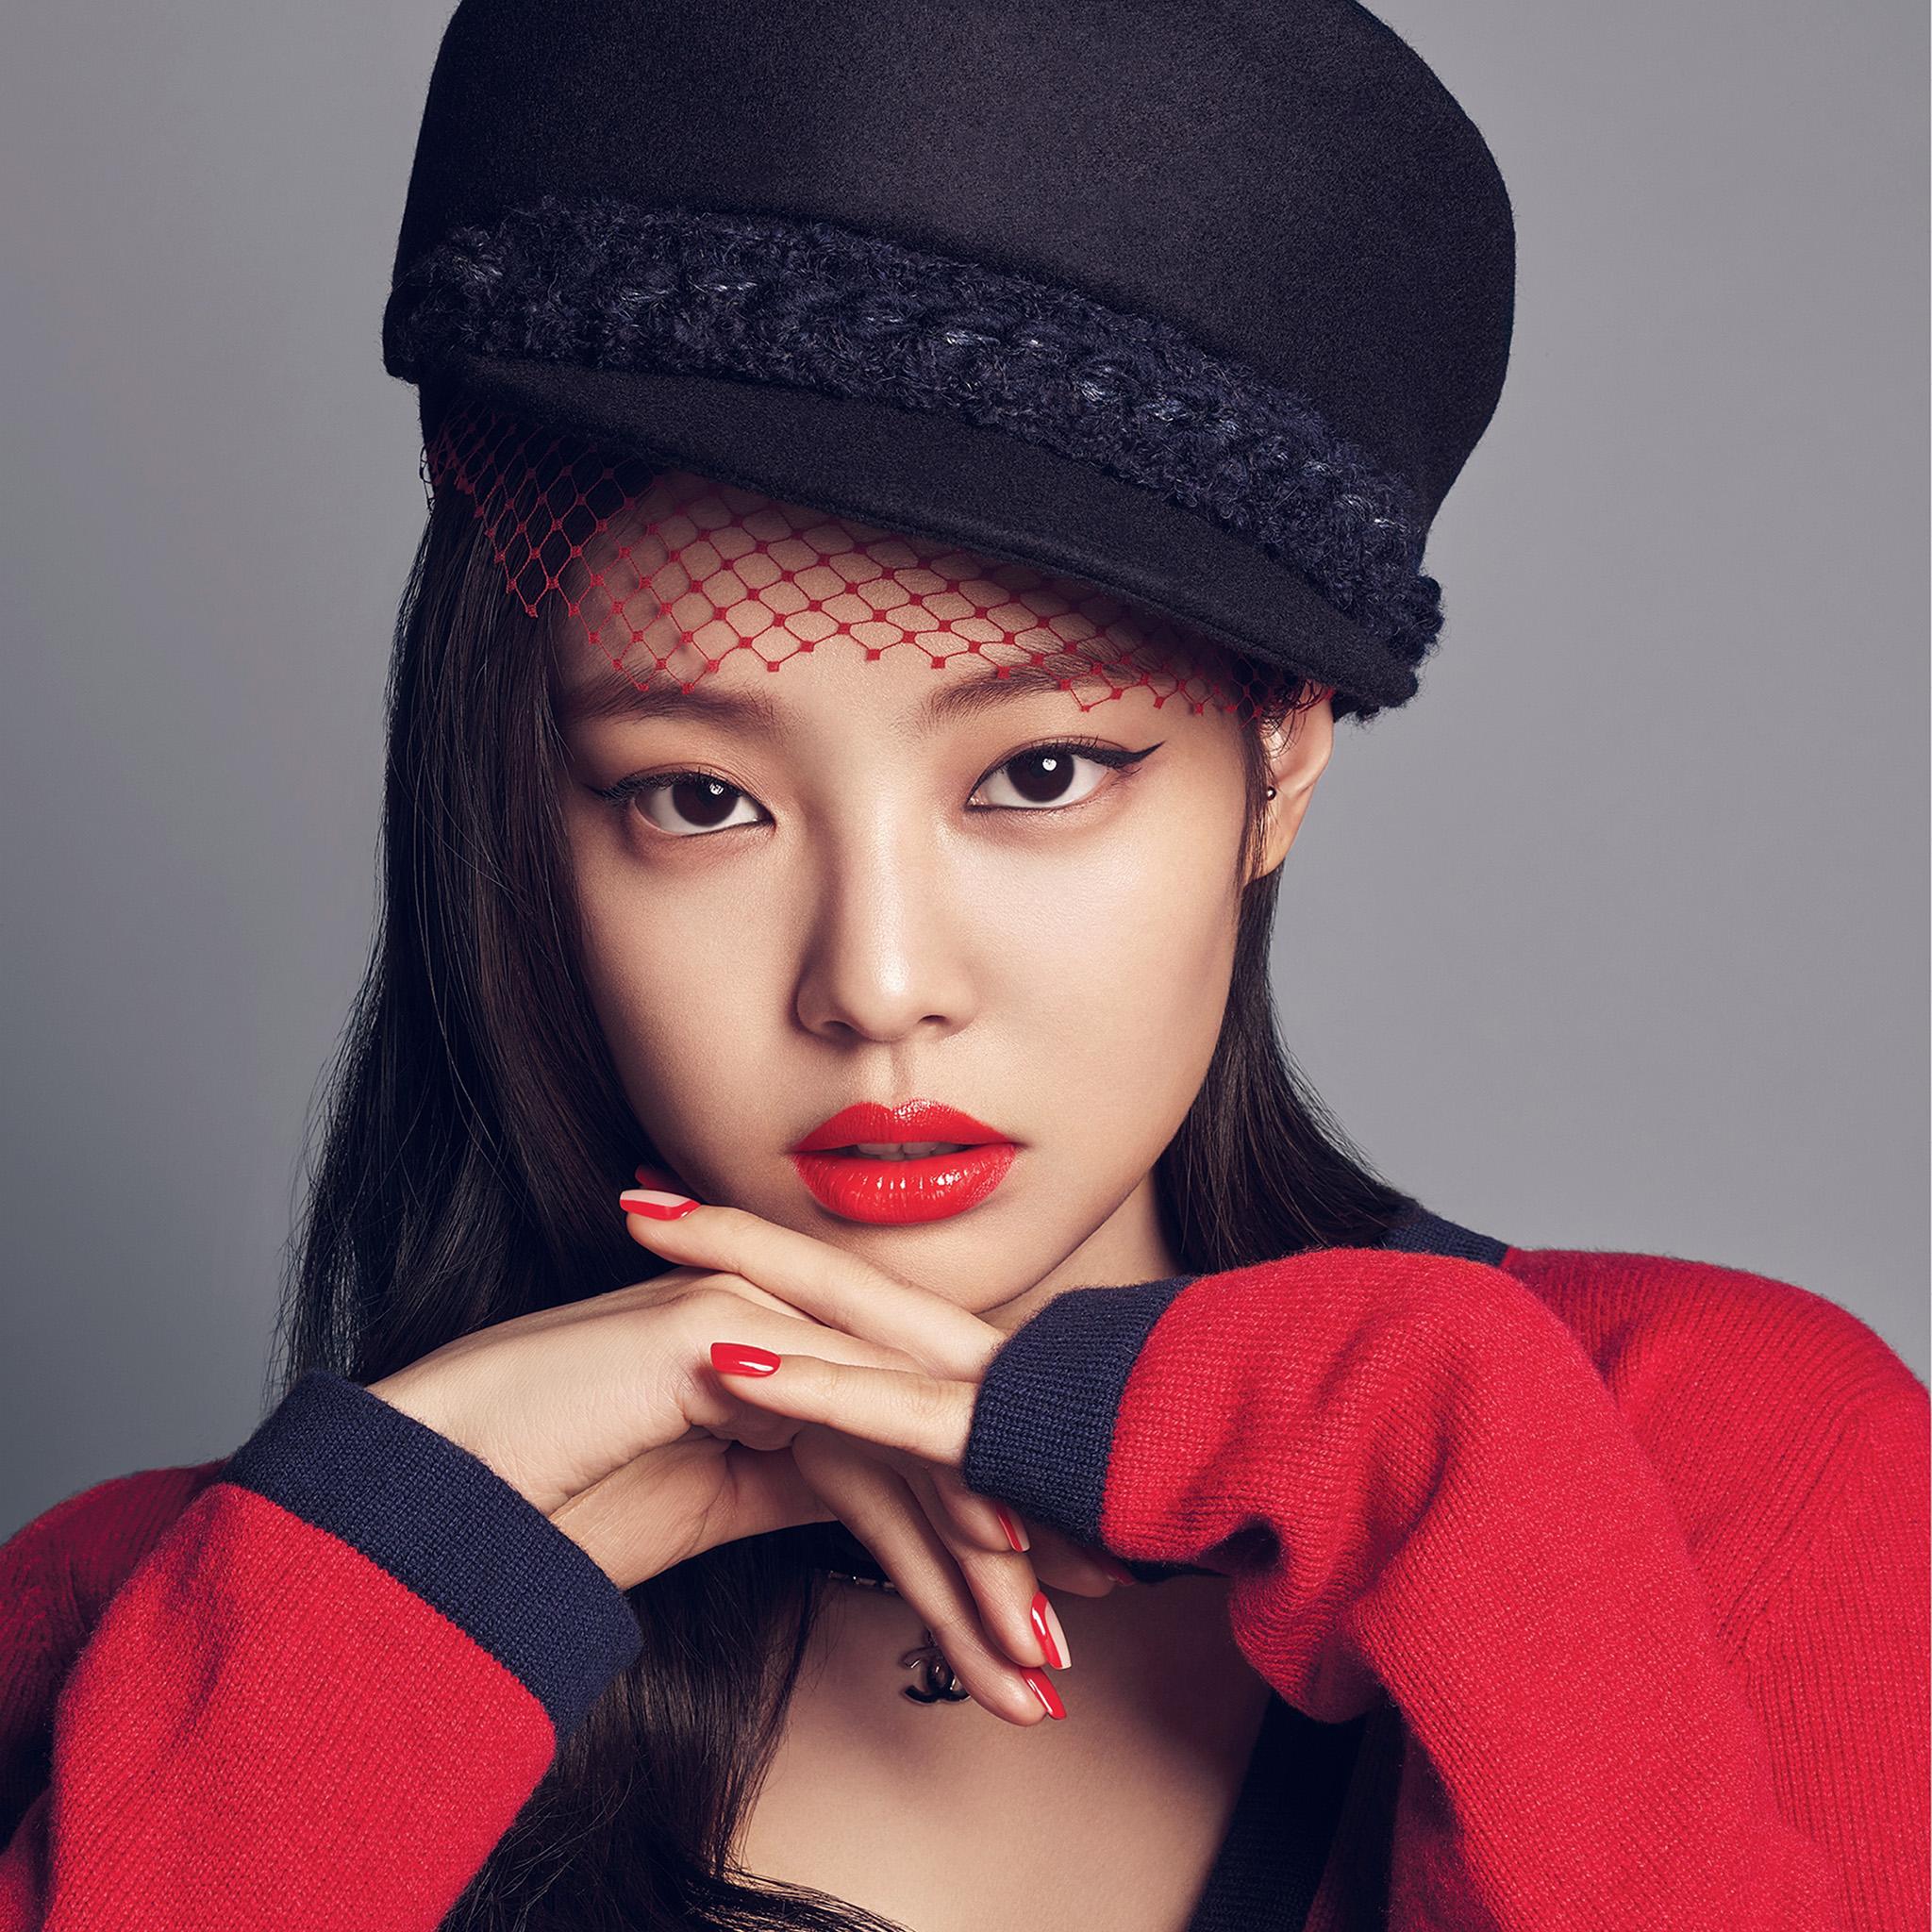 Wallpaper Black Pink: Hp37-blackpink-girl-kpop-jennie-wallpaper